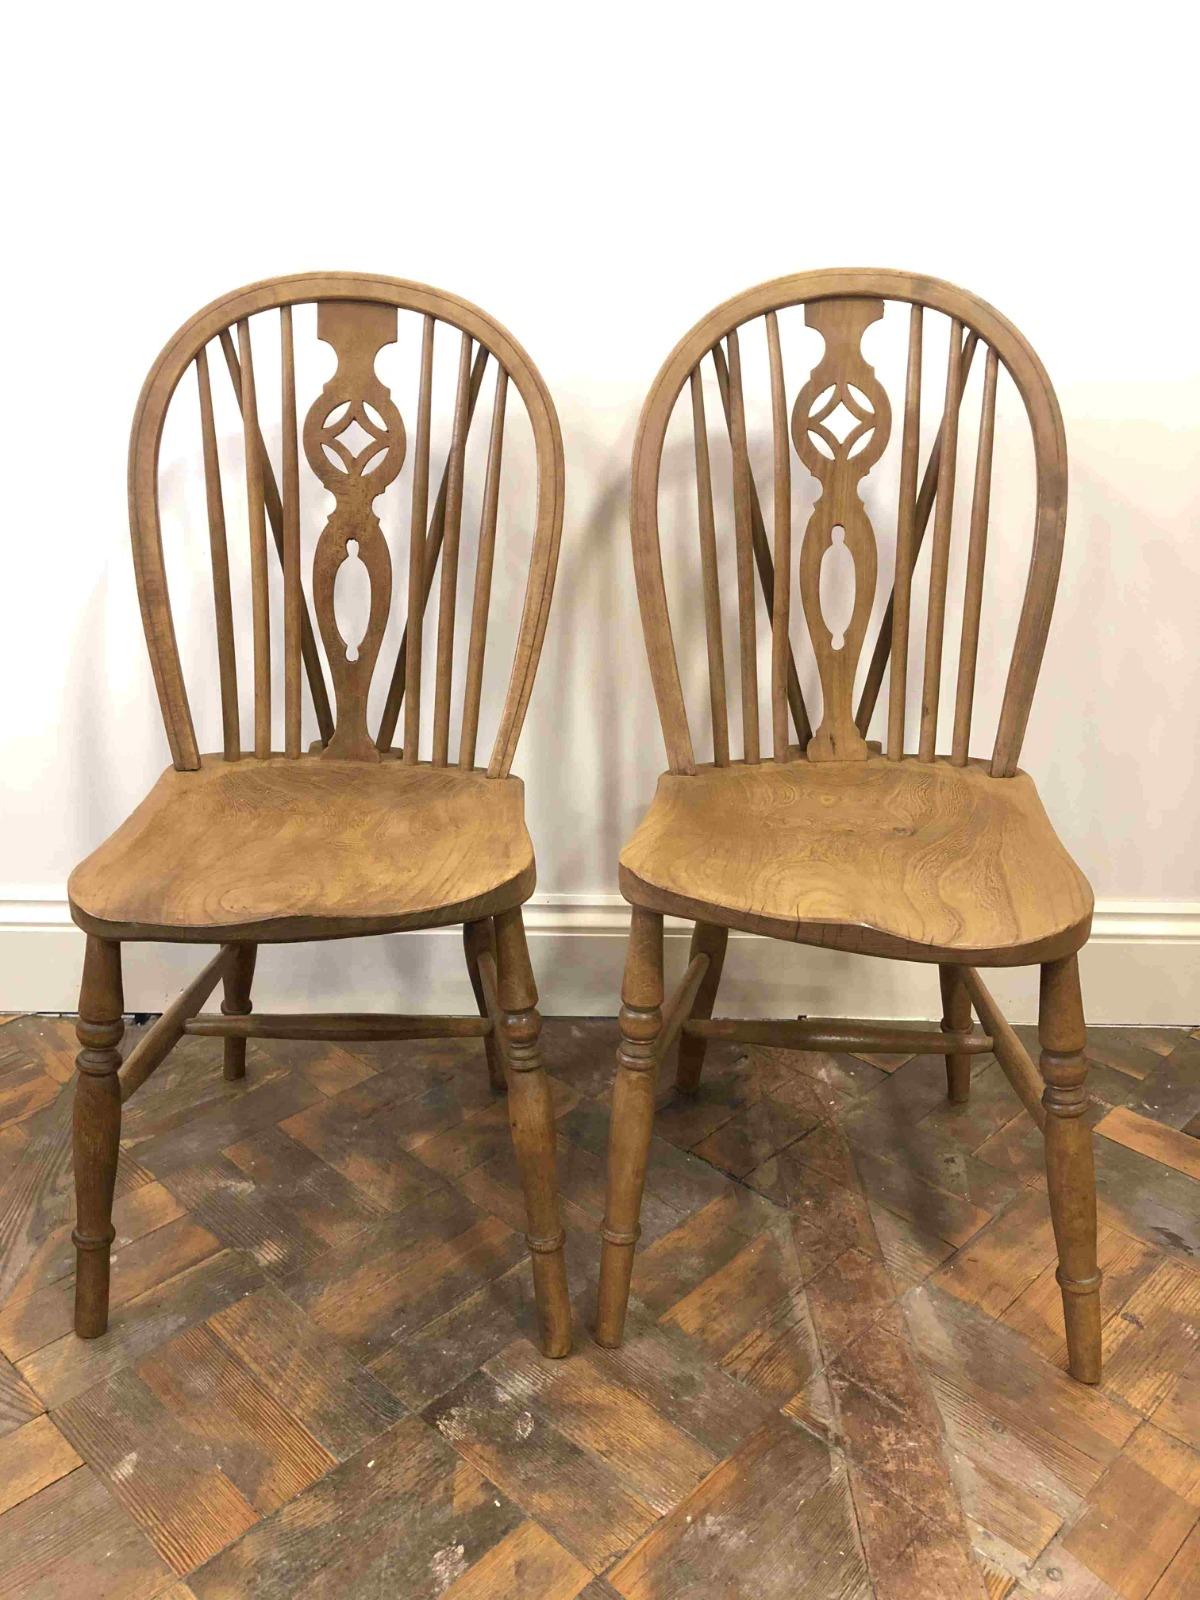 Pair Of Ash Elm Wheelback Country Kitchen Chairs B 657 La159593 Loveantiques Com